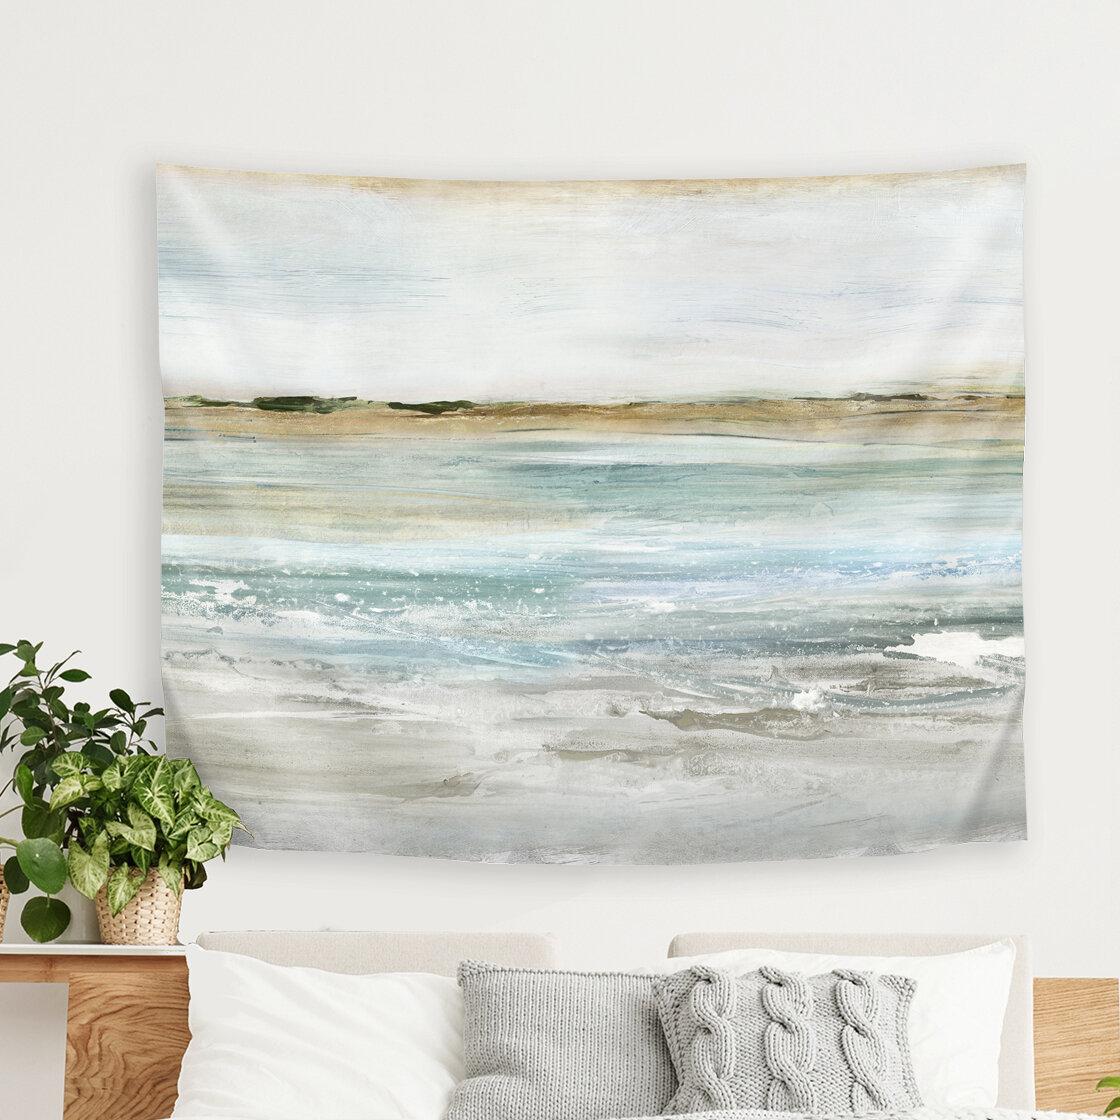 Ocean Beach Tapestries You Ll Love In 2021 Wayfair